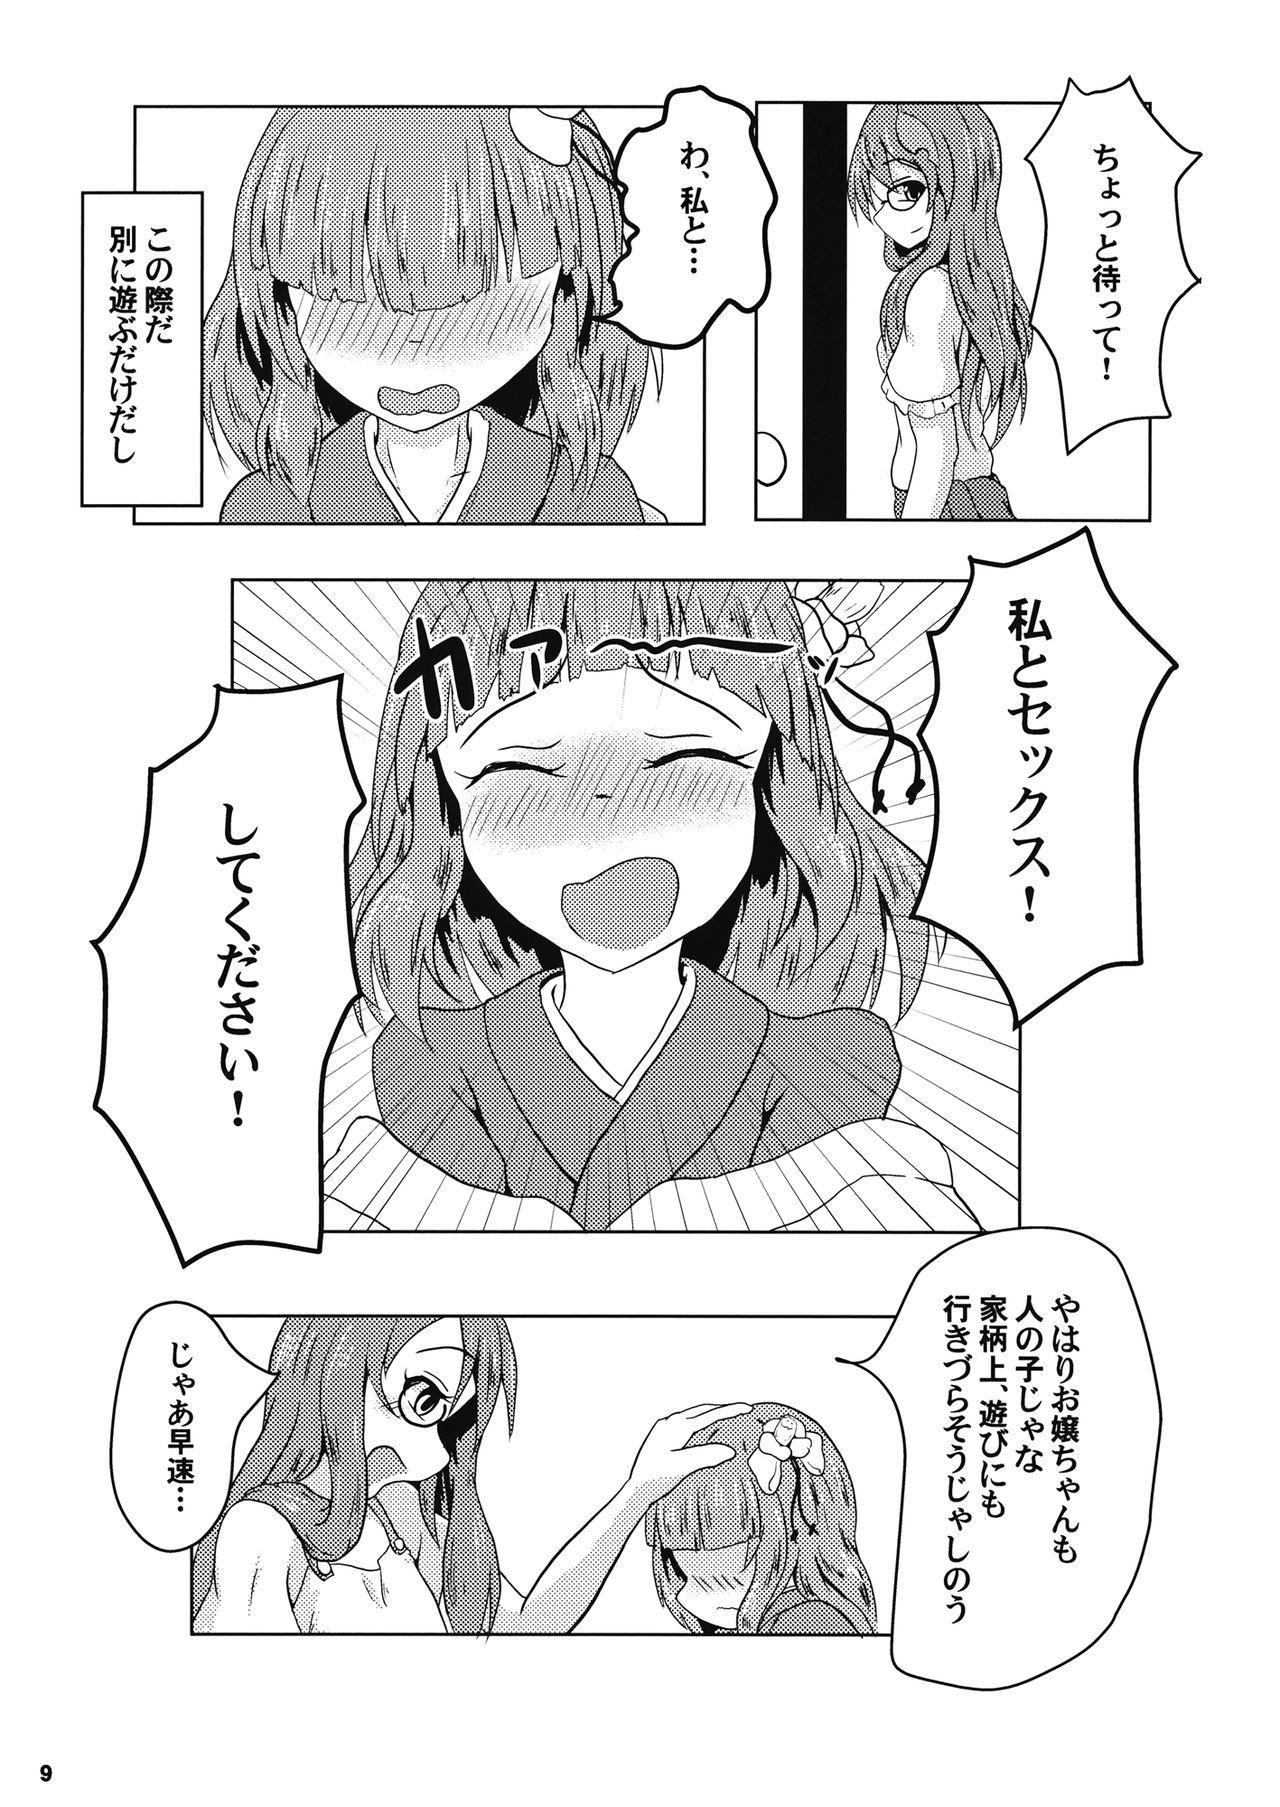 Ochiru Otome to Bakedanuki 9